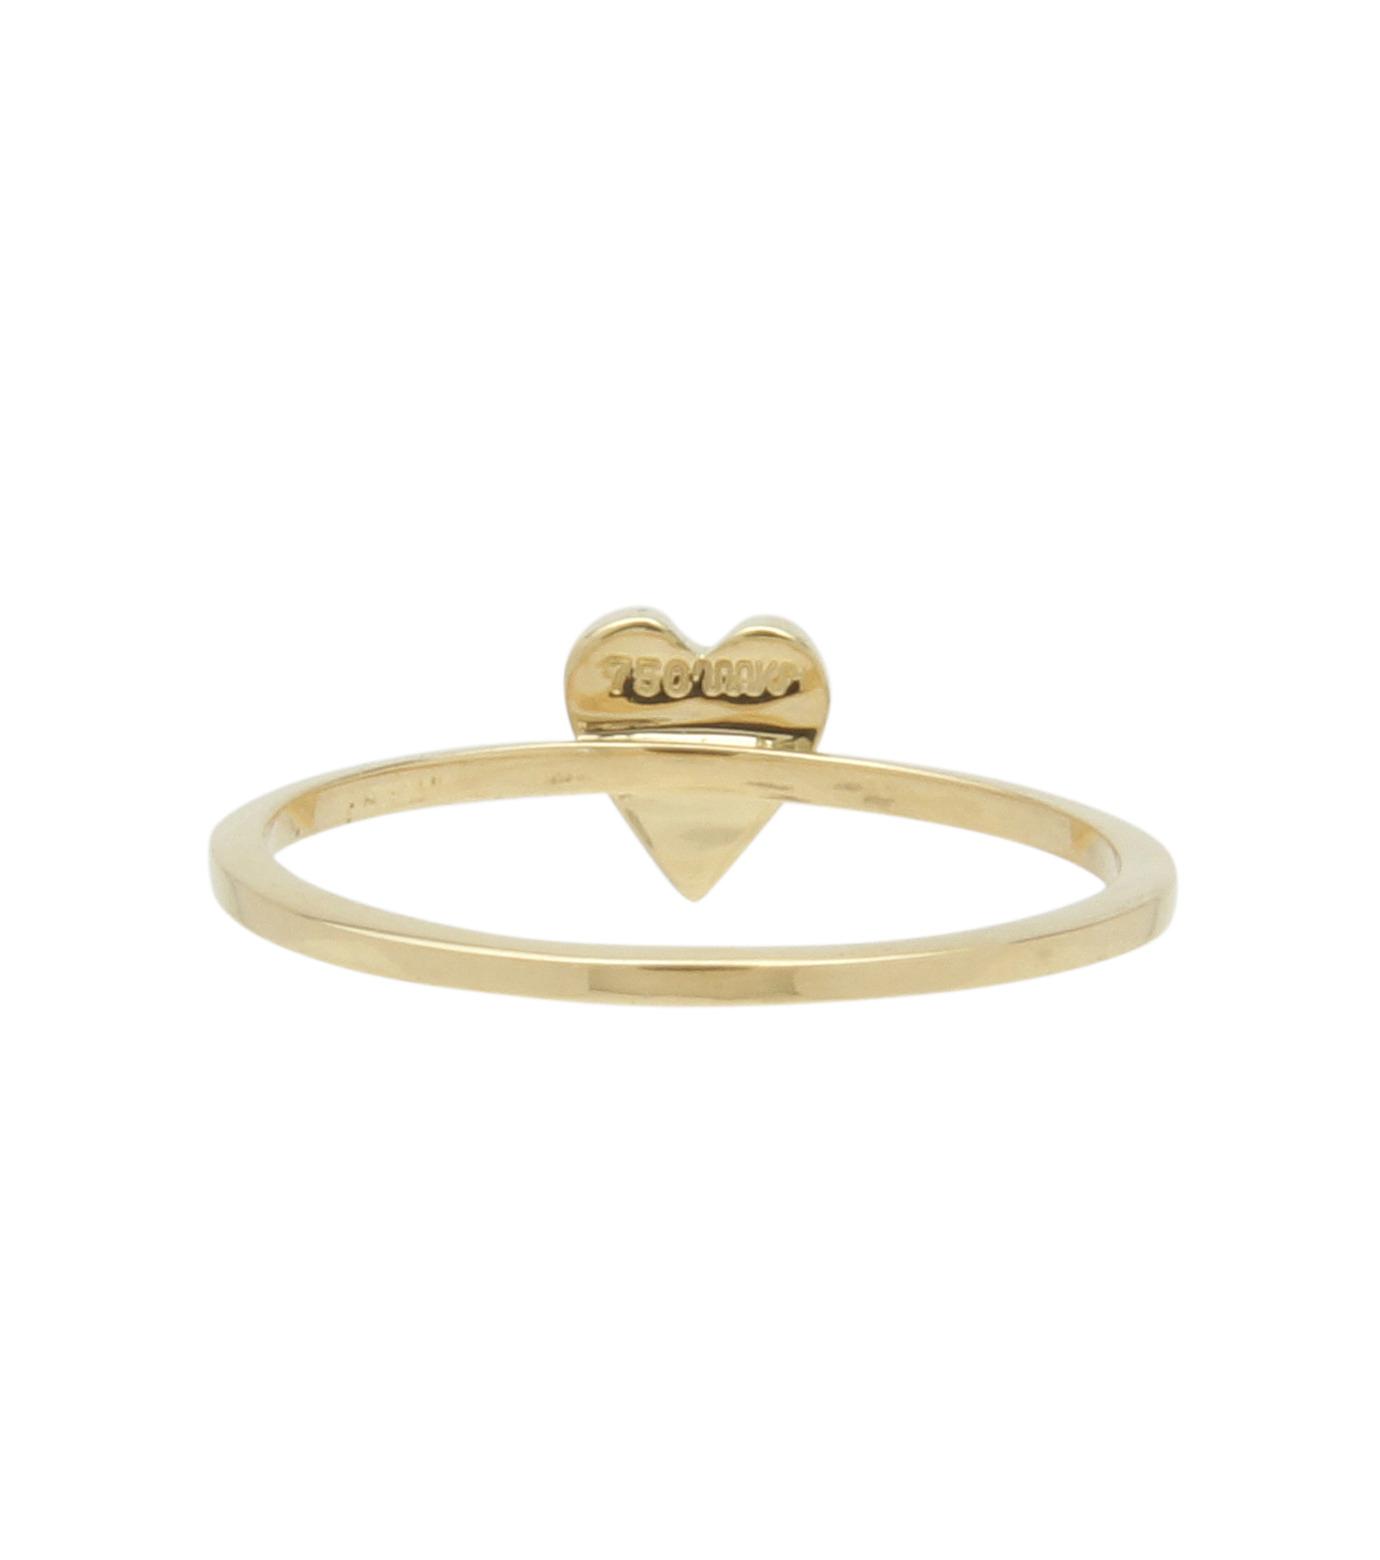 Ileana Makri(イリーナ マクリ)のLove Ring Yellow Gold-YELLOW(リング/ring)-O272-02-099-32 拡大詳細画像3